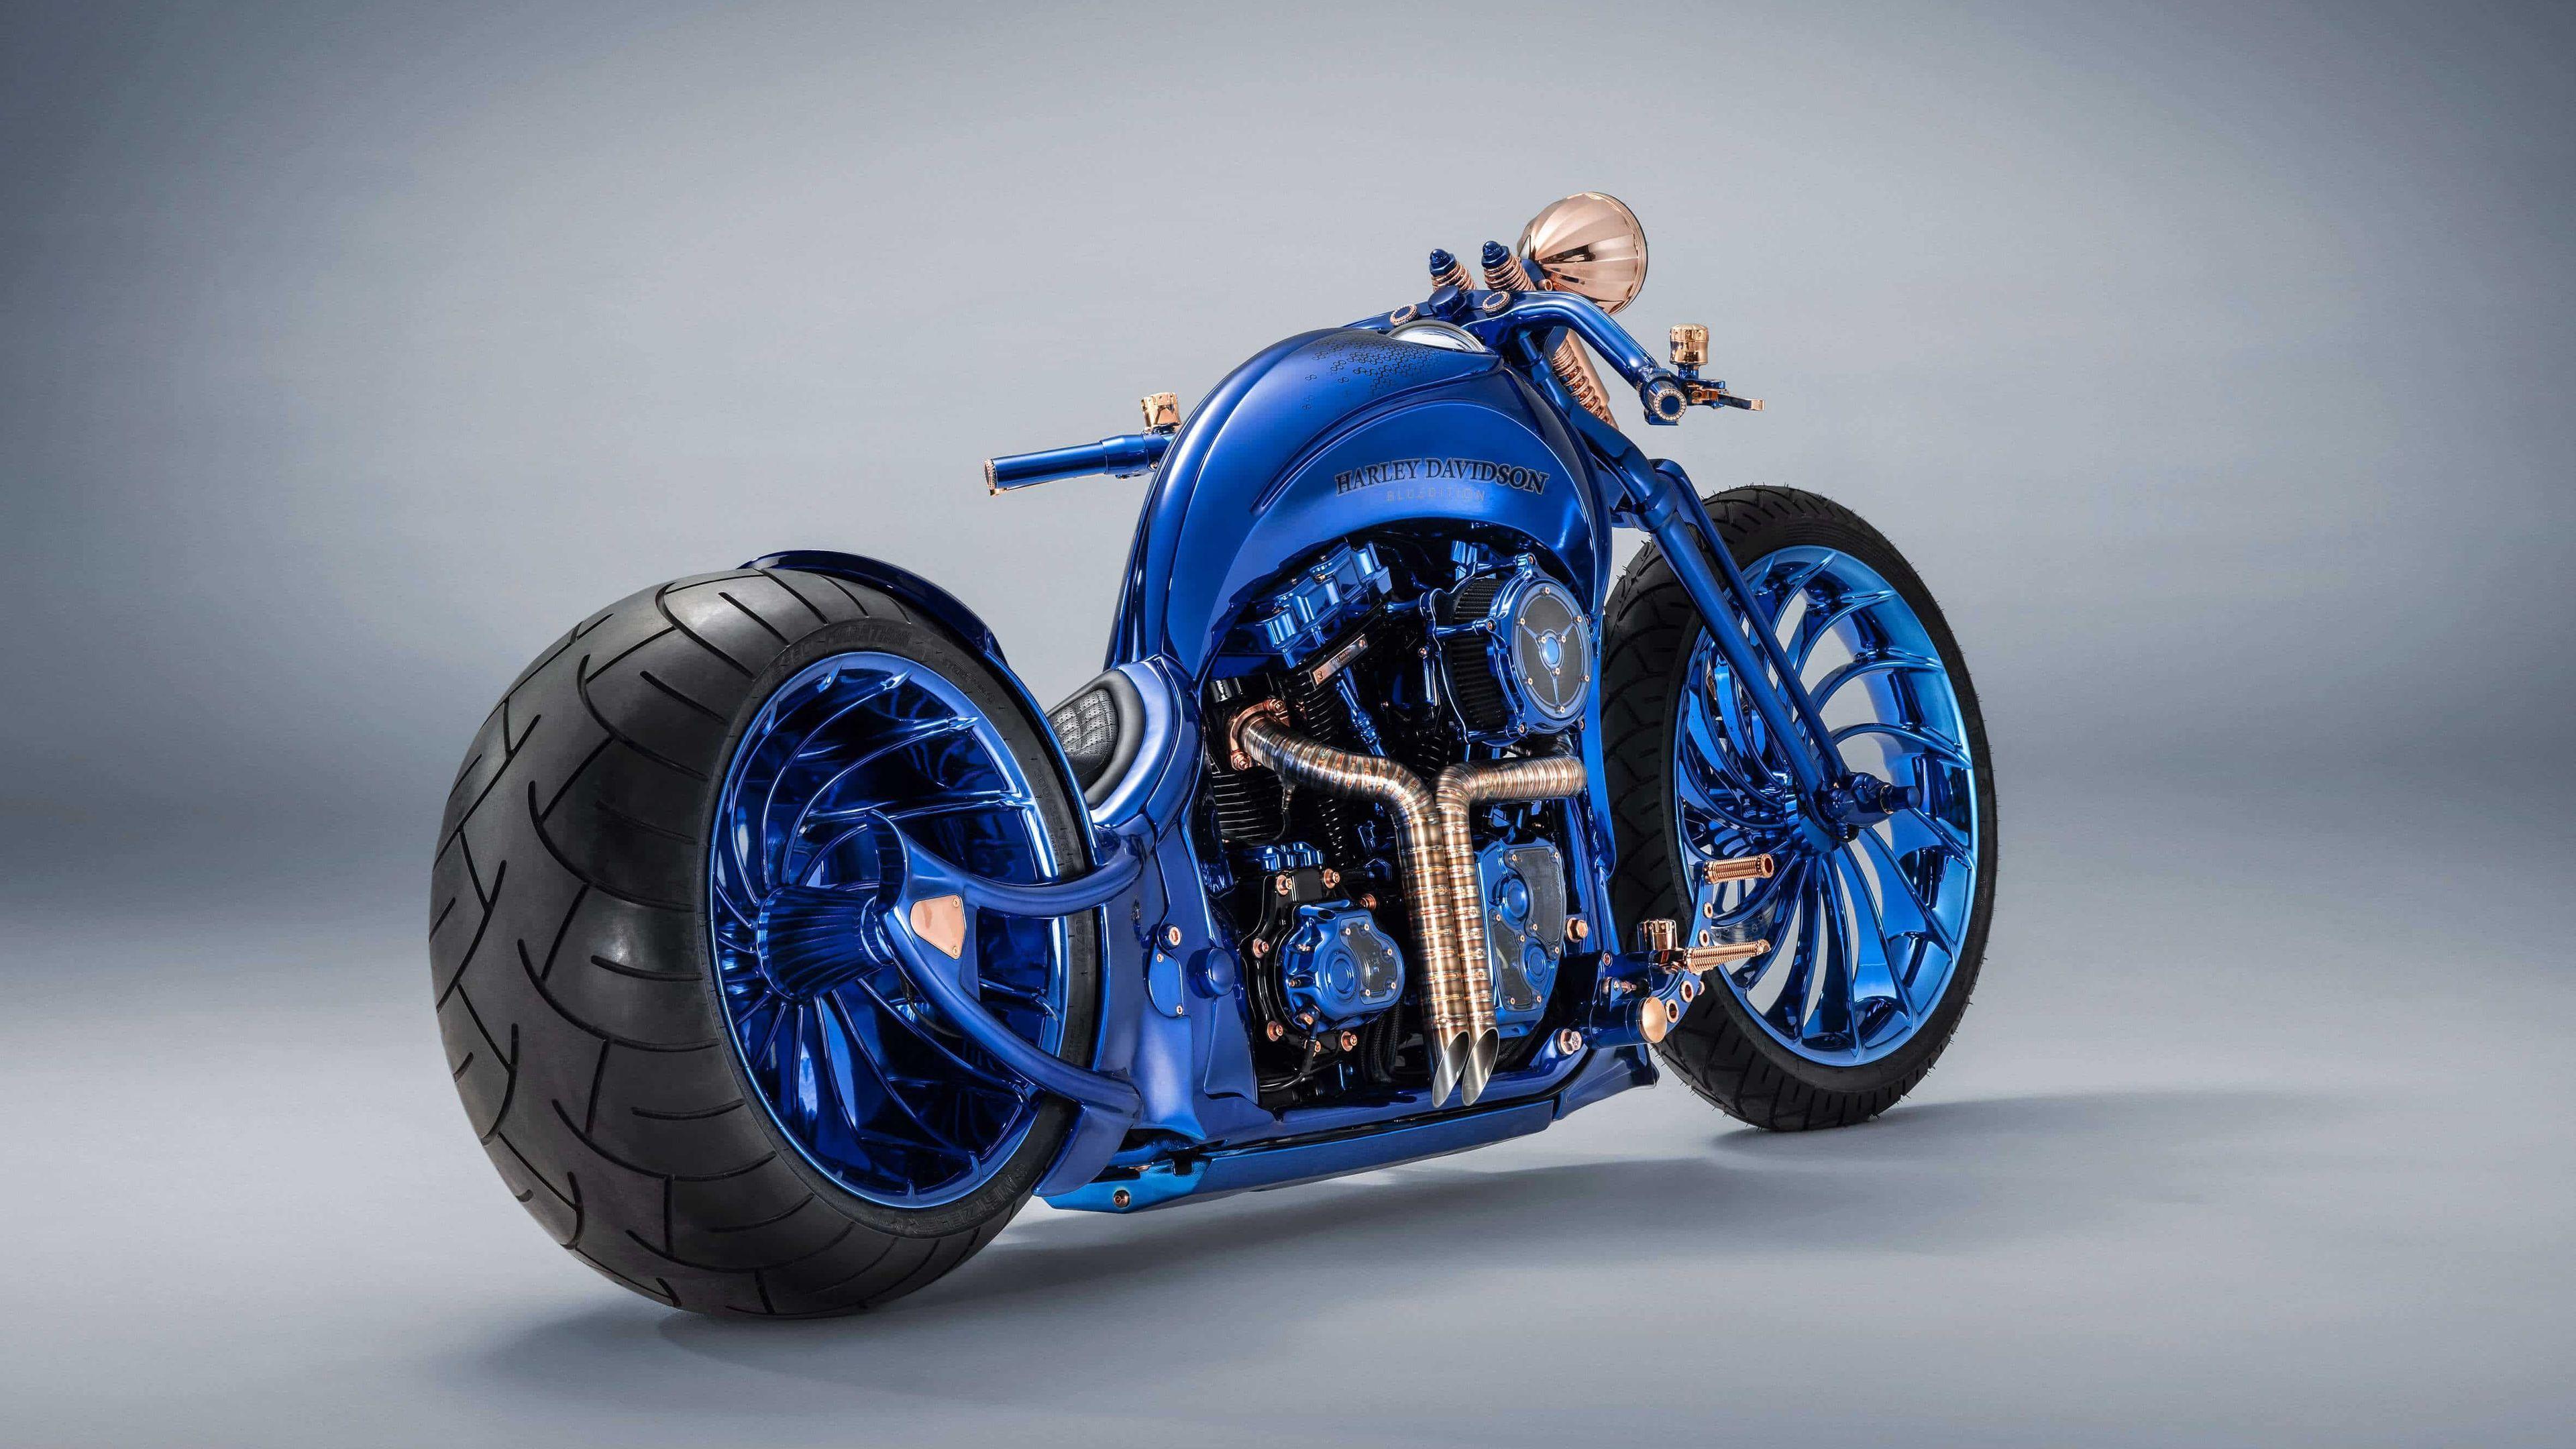 Harley Davidson Blue Edition 4k Hd Wallpapers Harley Davidson Wallpapers Bikes Harley Davidson Motorcycles Harley Davidson Wallpaper Classic Harley Davidson